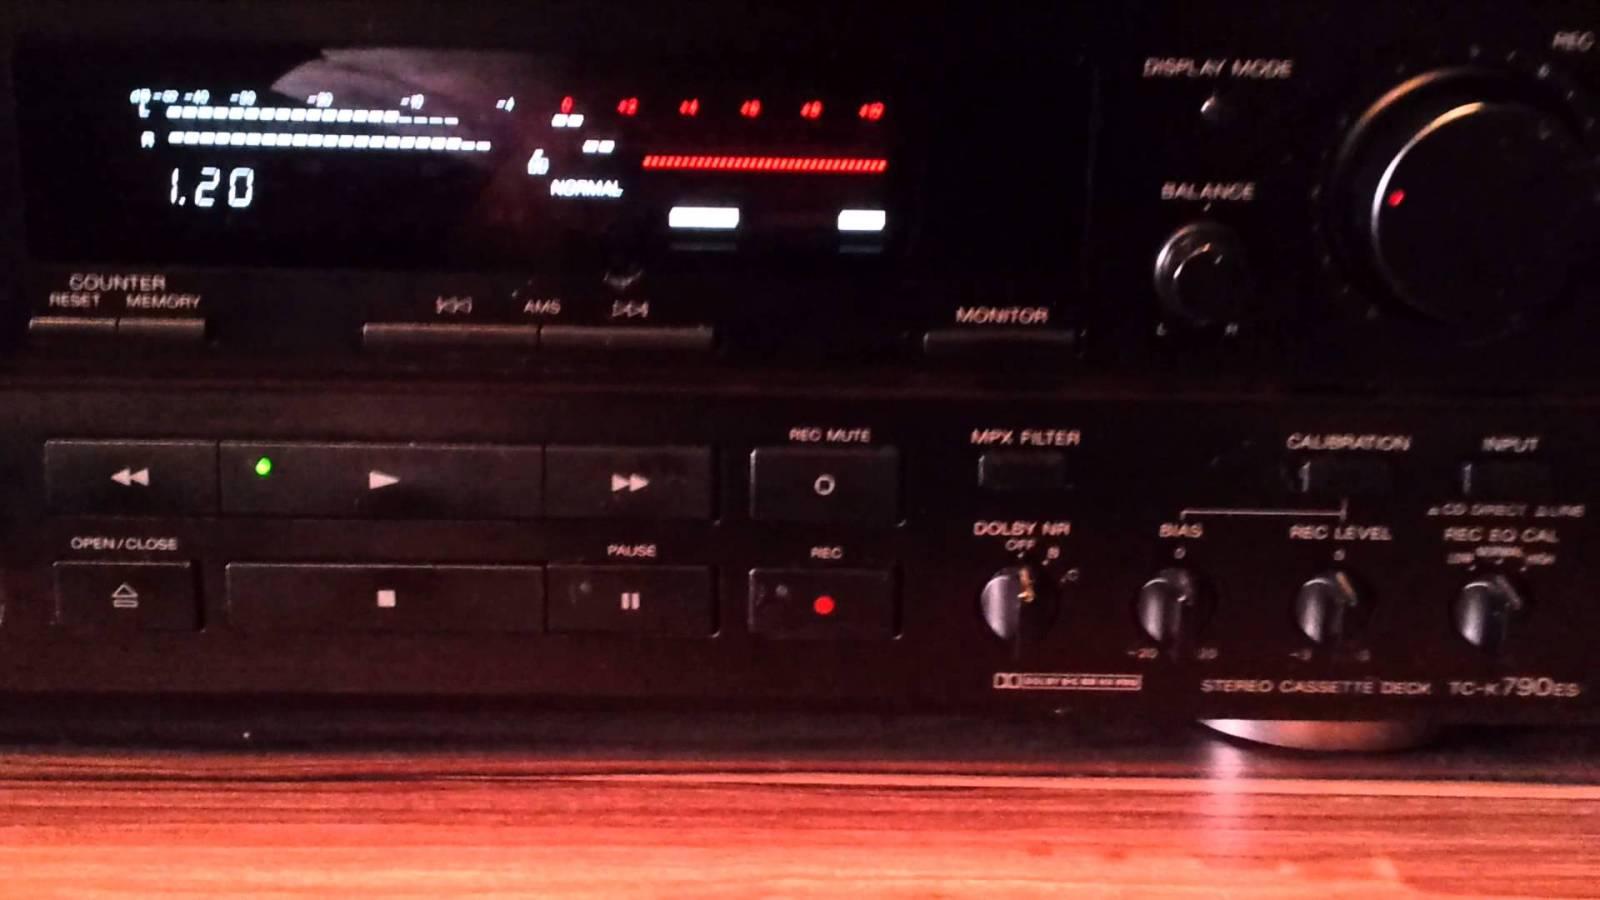 Calibrar Bias Sony TC-K790ES - Help!!!!! Dhg510